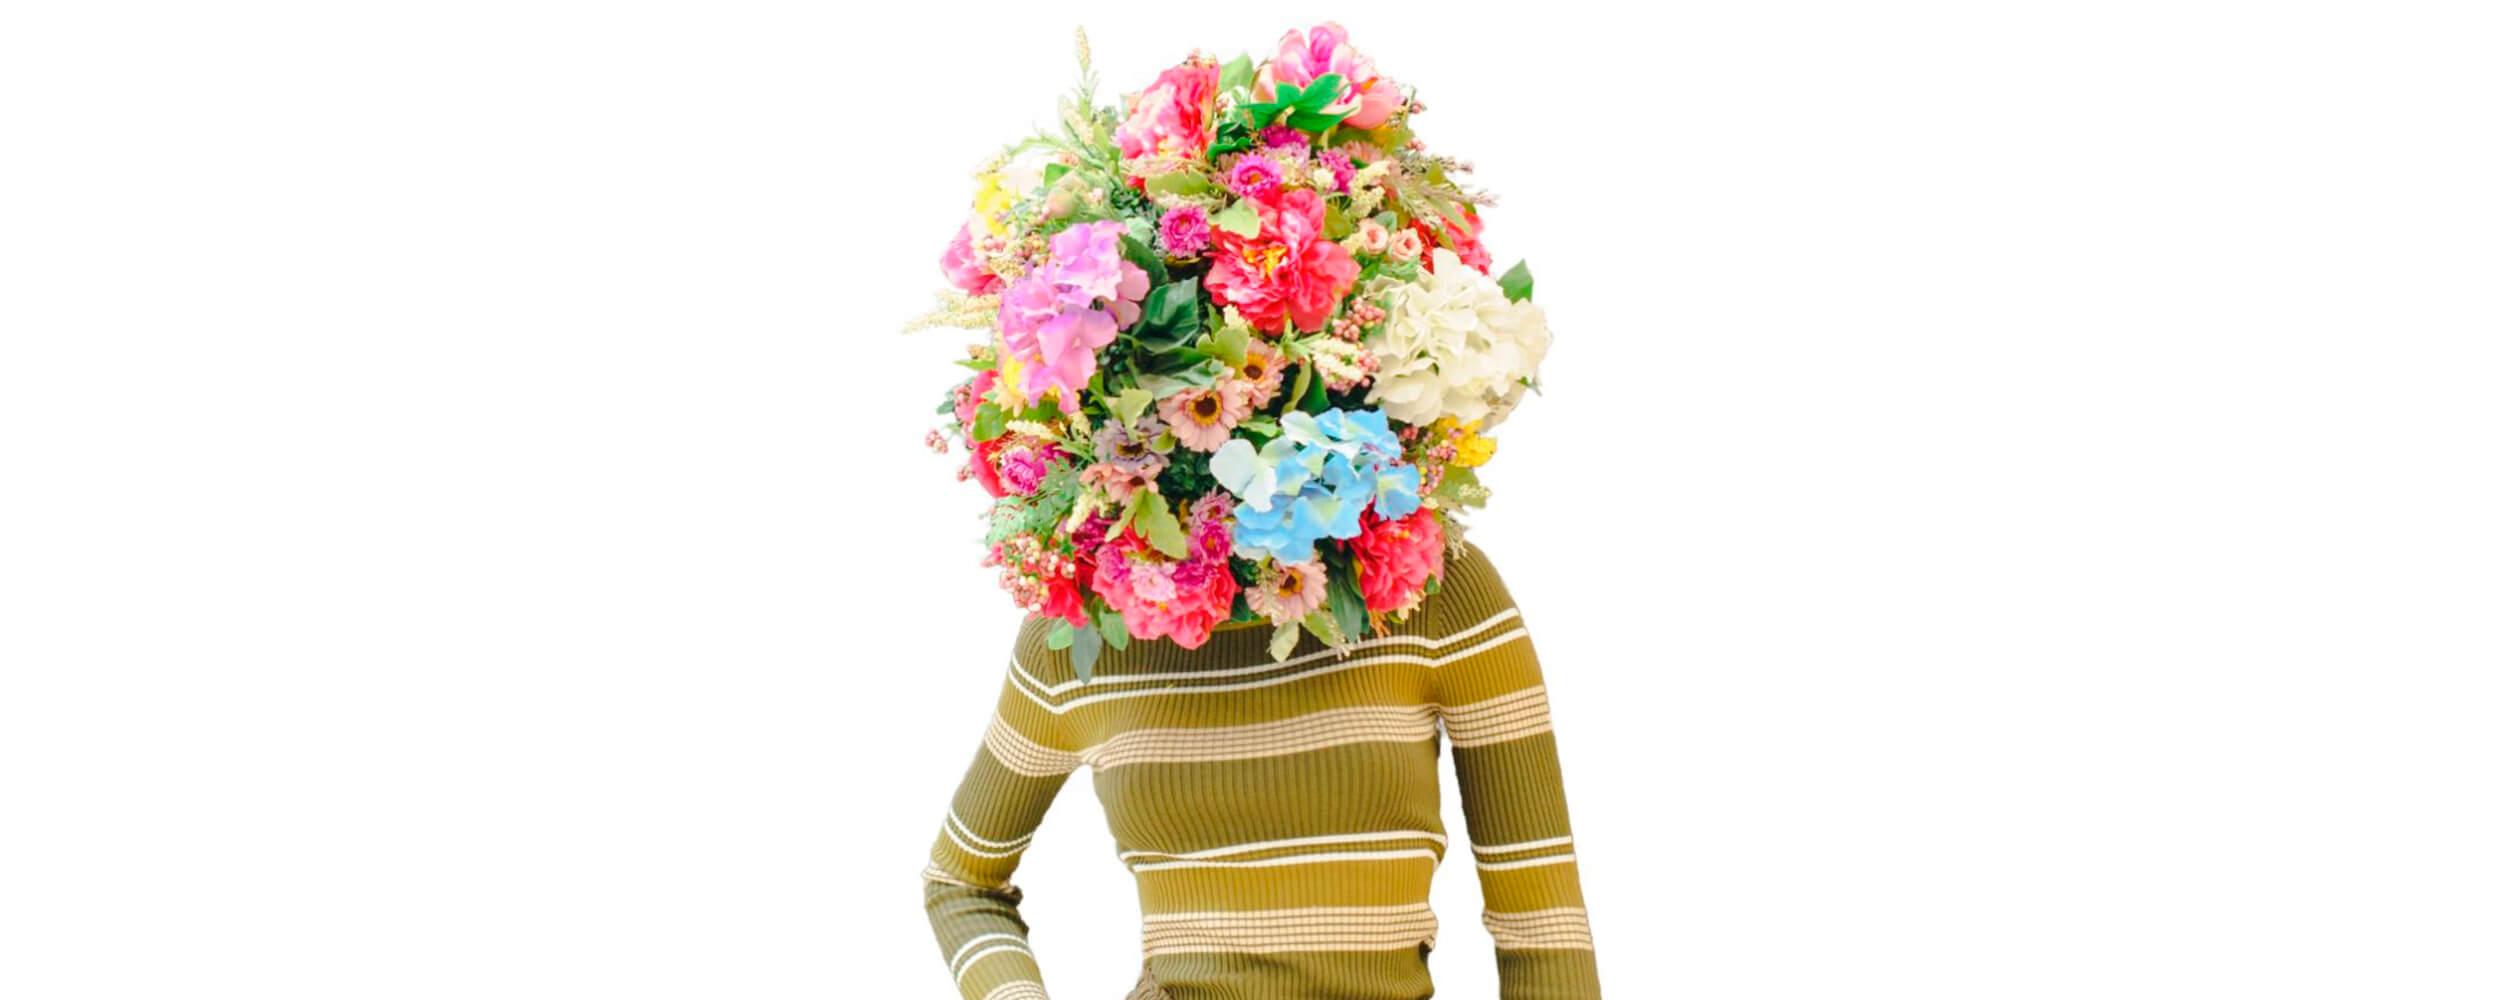 Woman with flowerhead